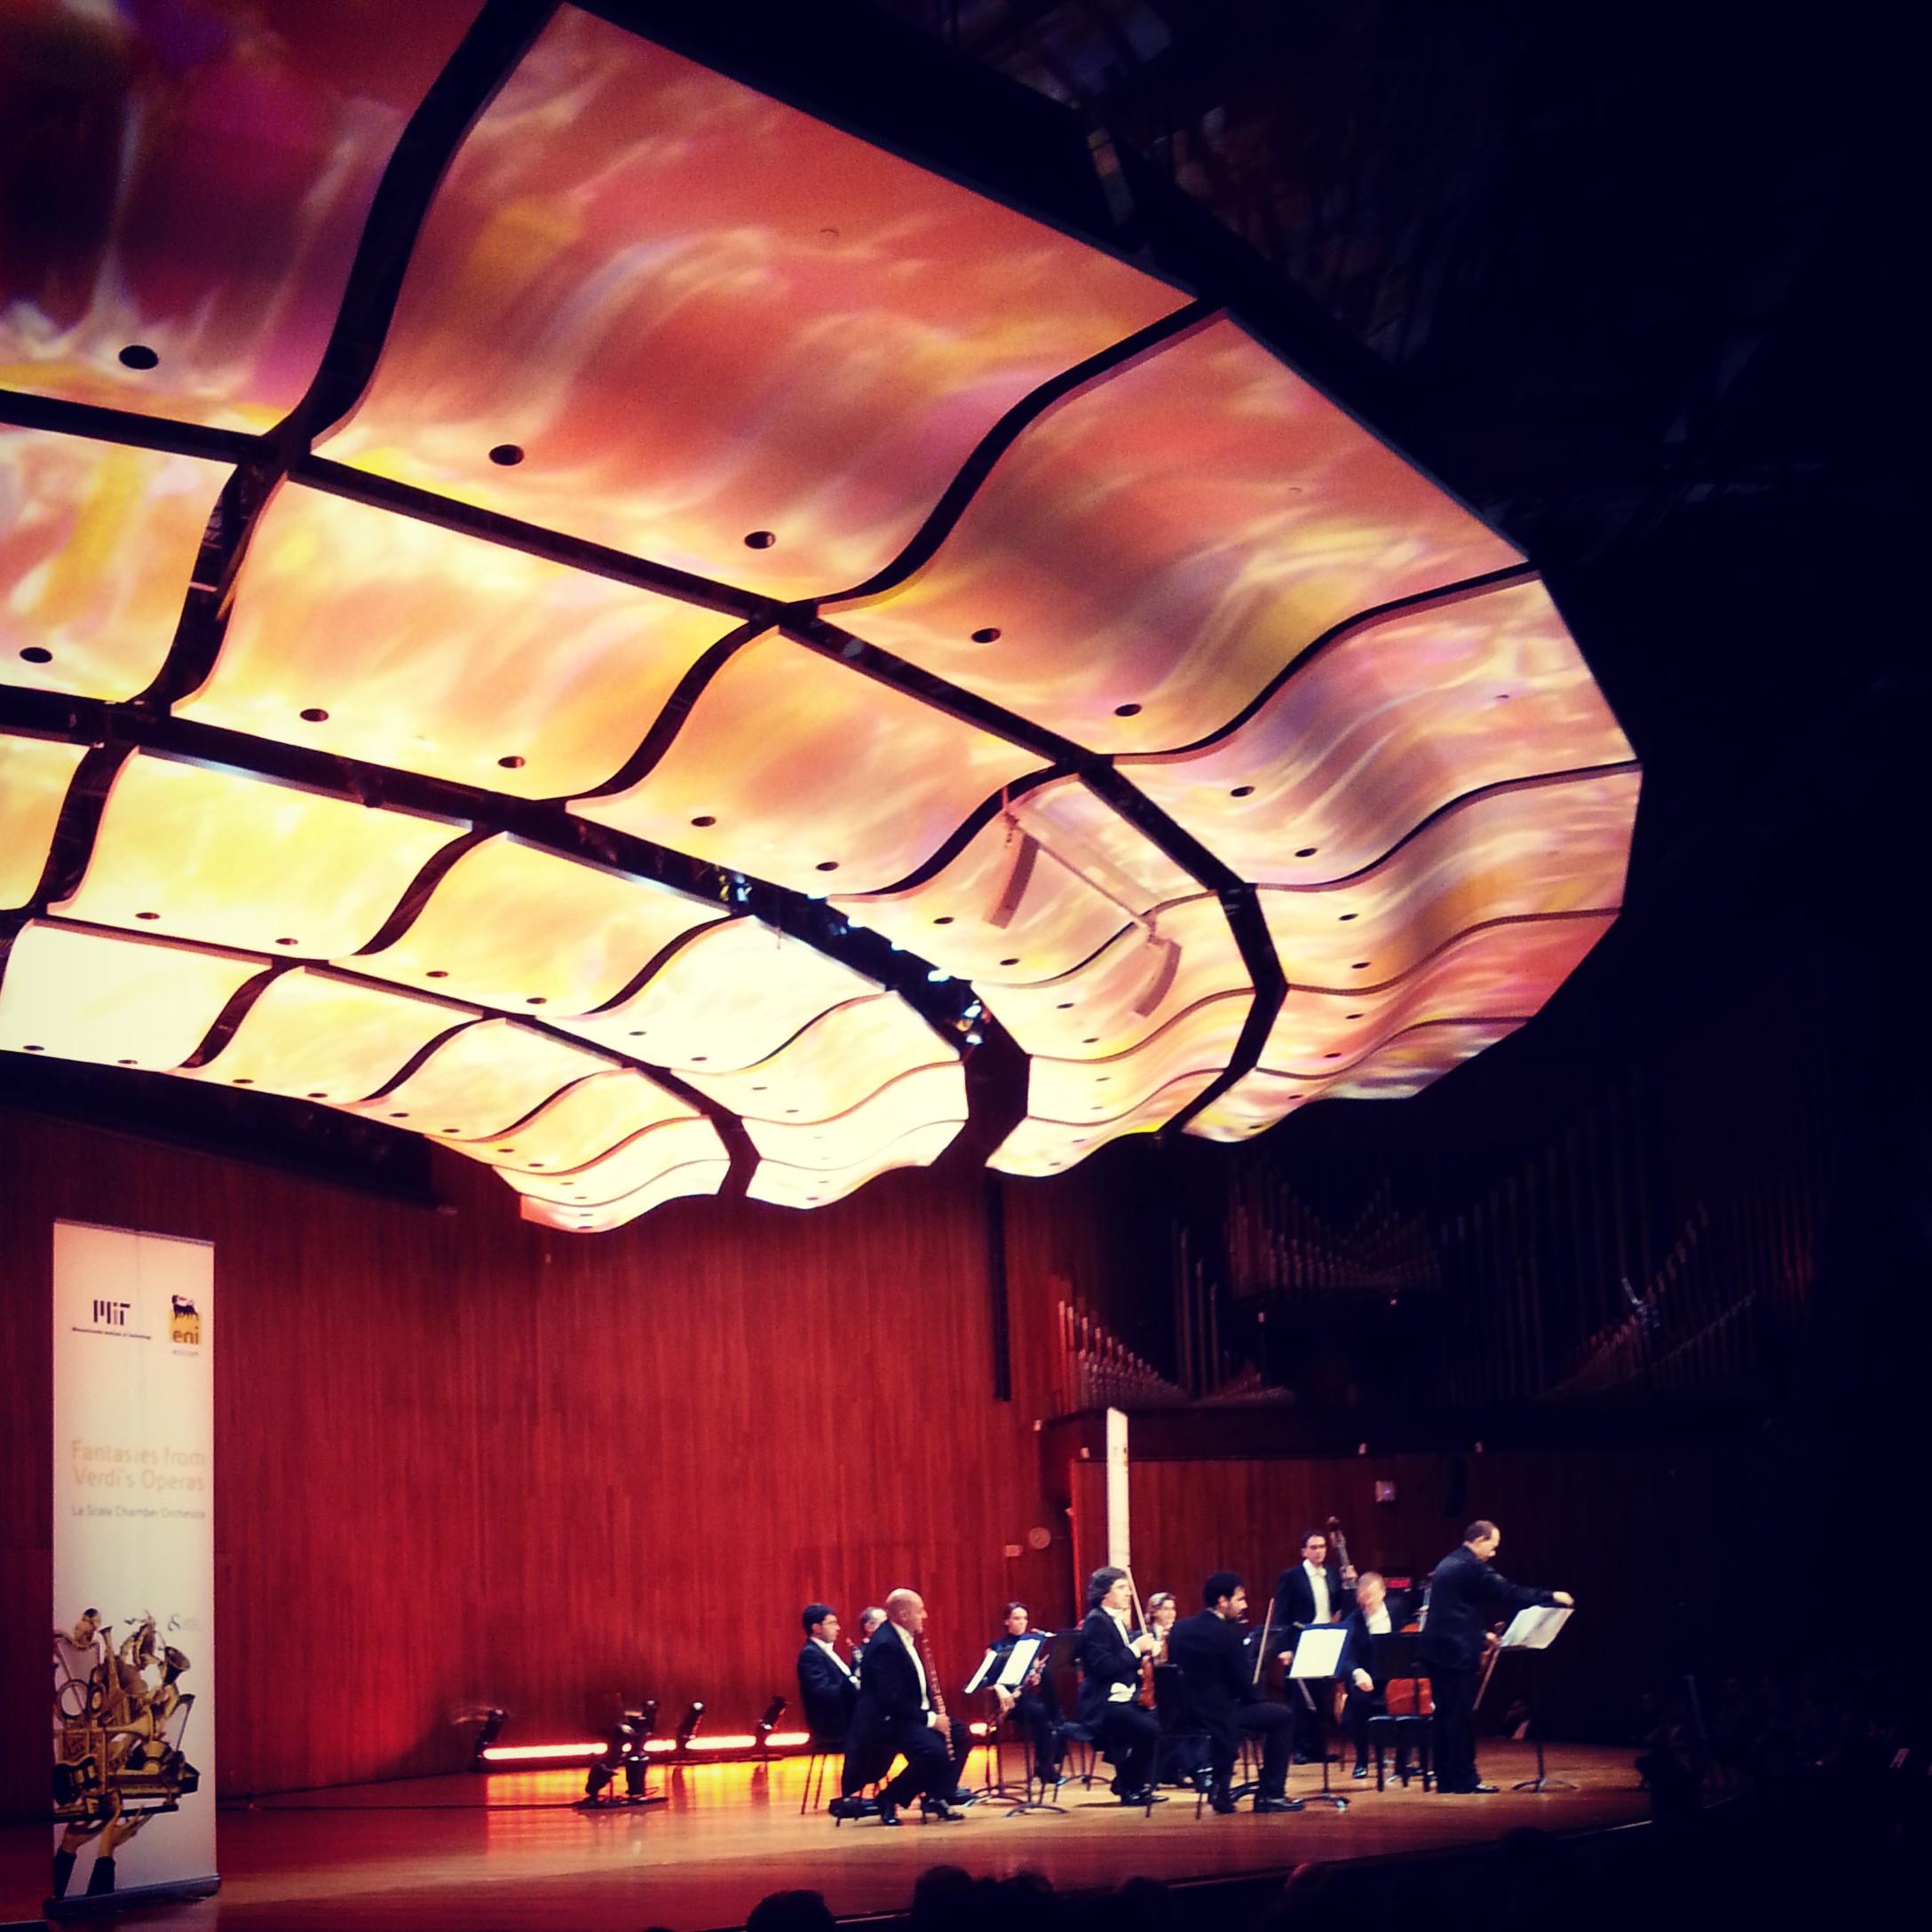 Teatro alla Scala Chamber Orchestra performing at MIT (sonya kovacic)